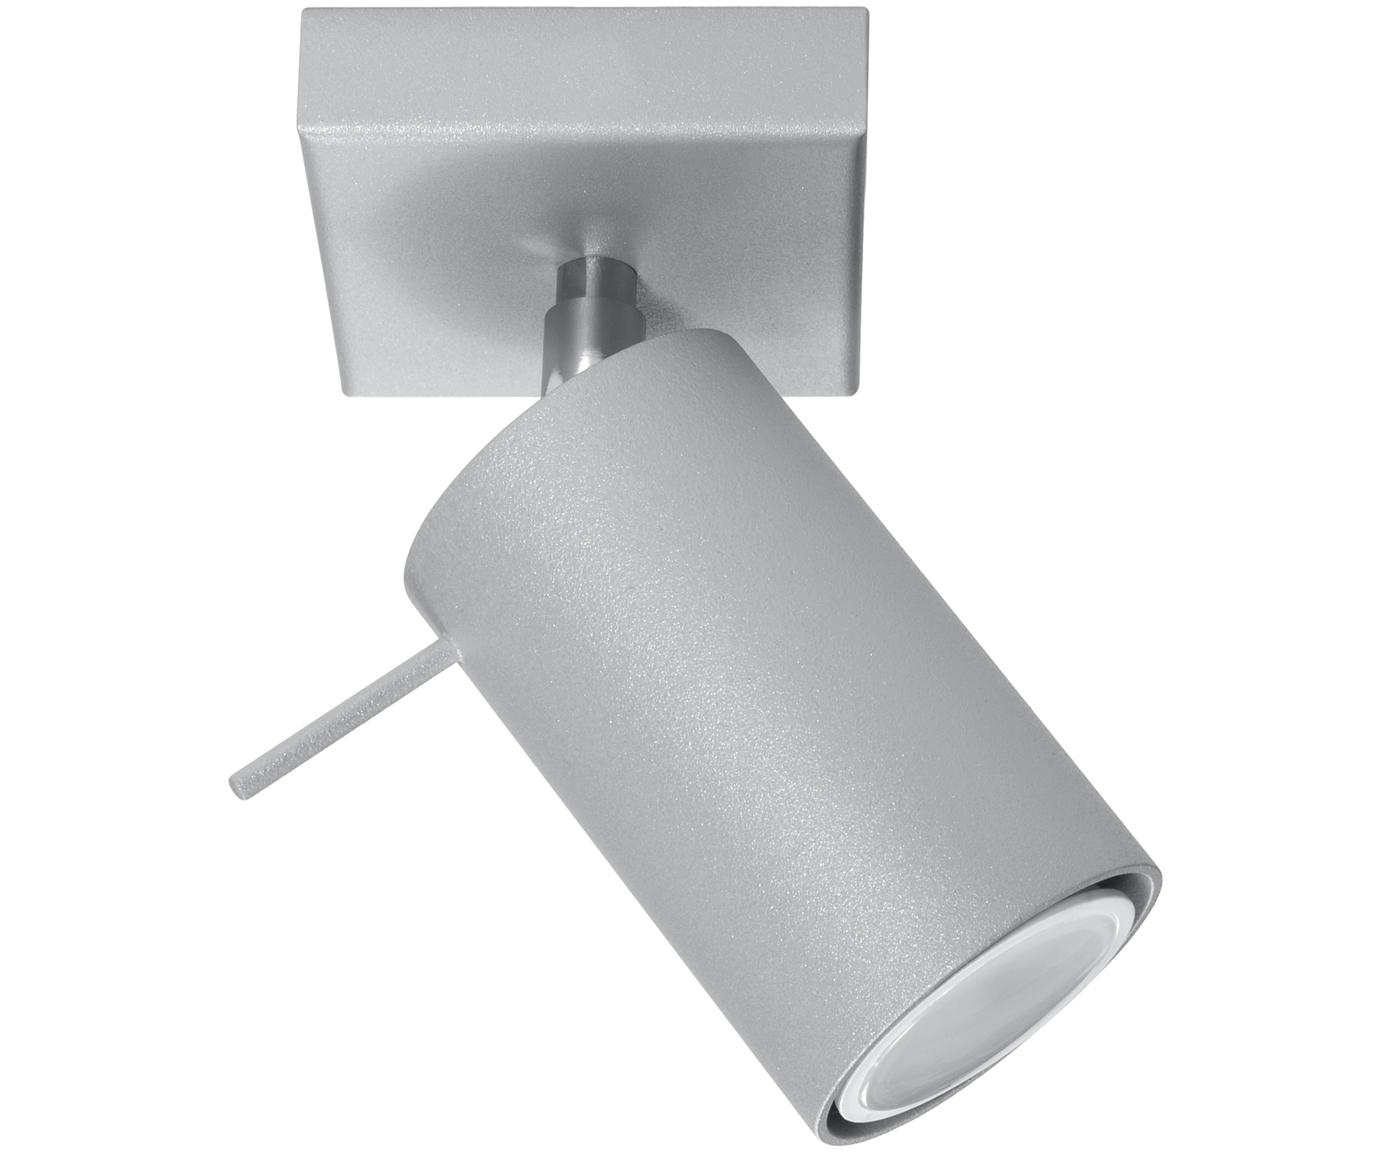 Deckenstrahler Etna in Grau, Stahl, lackiert, Grau, 10 x 15 cm